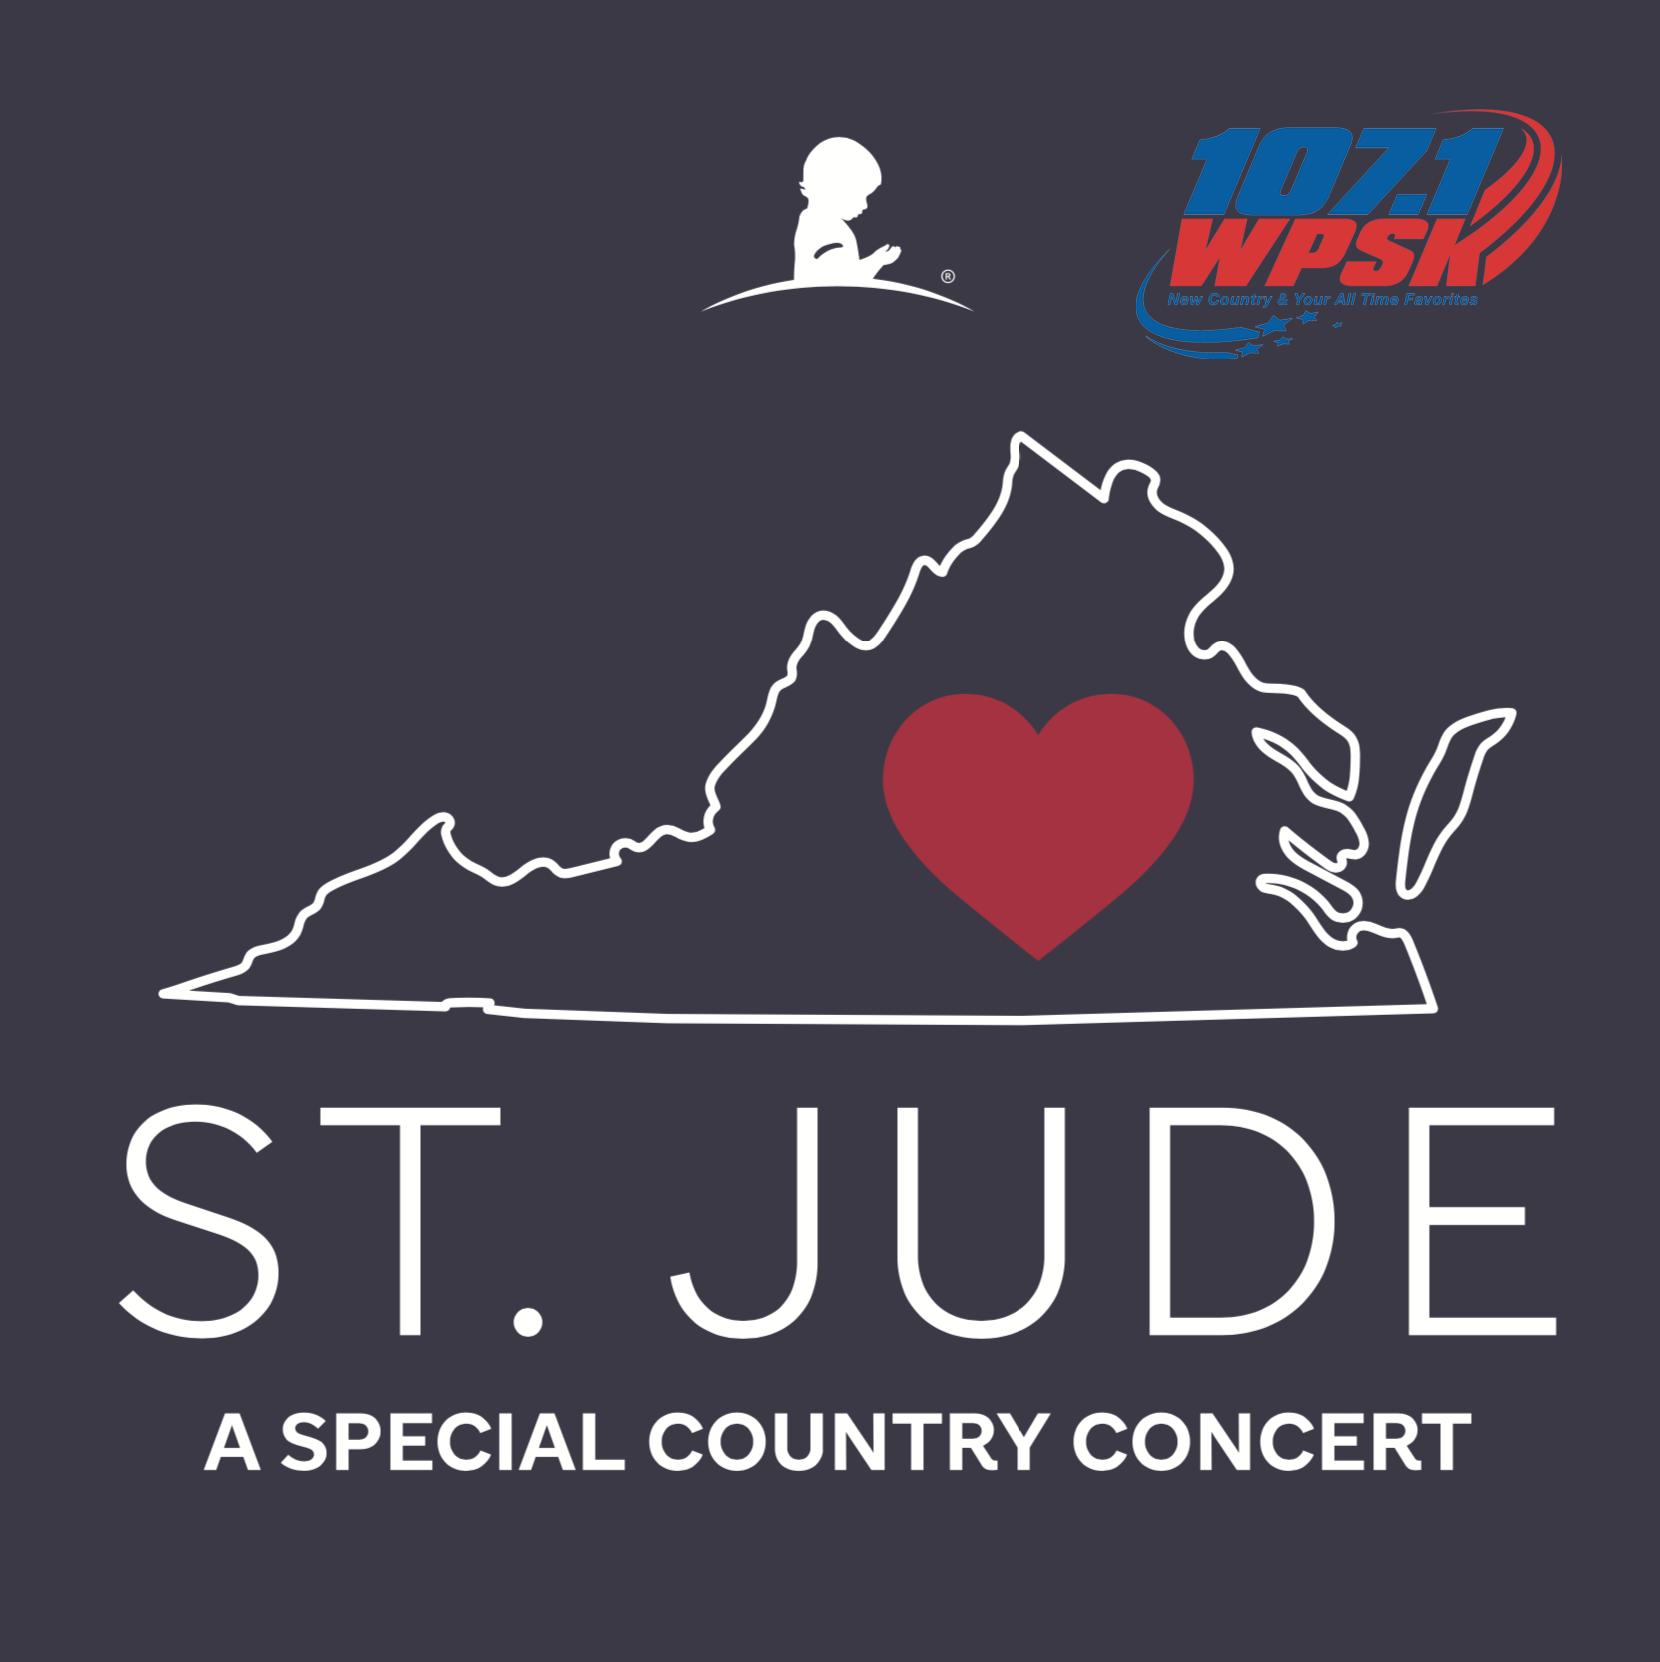 VA Loves SJ_graphic with PSK logo